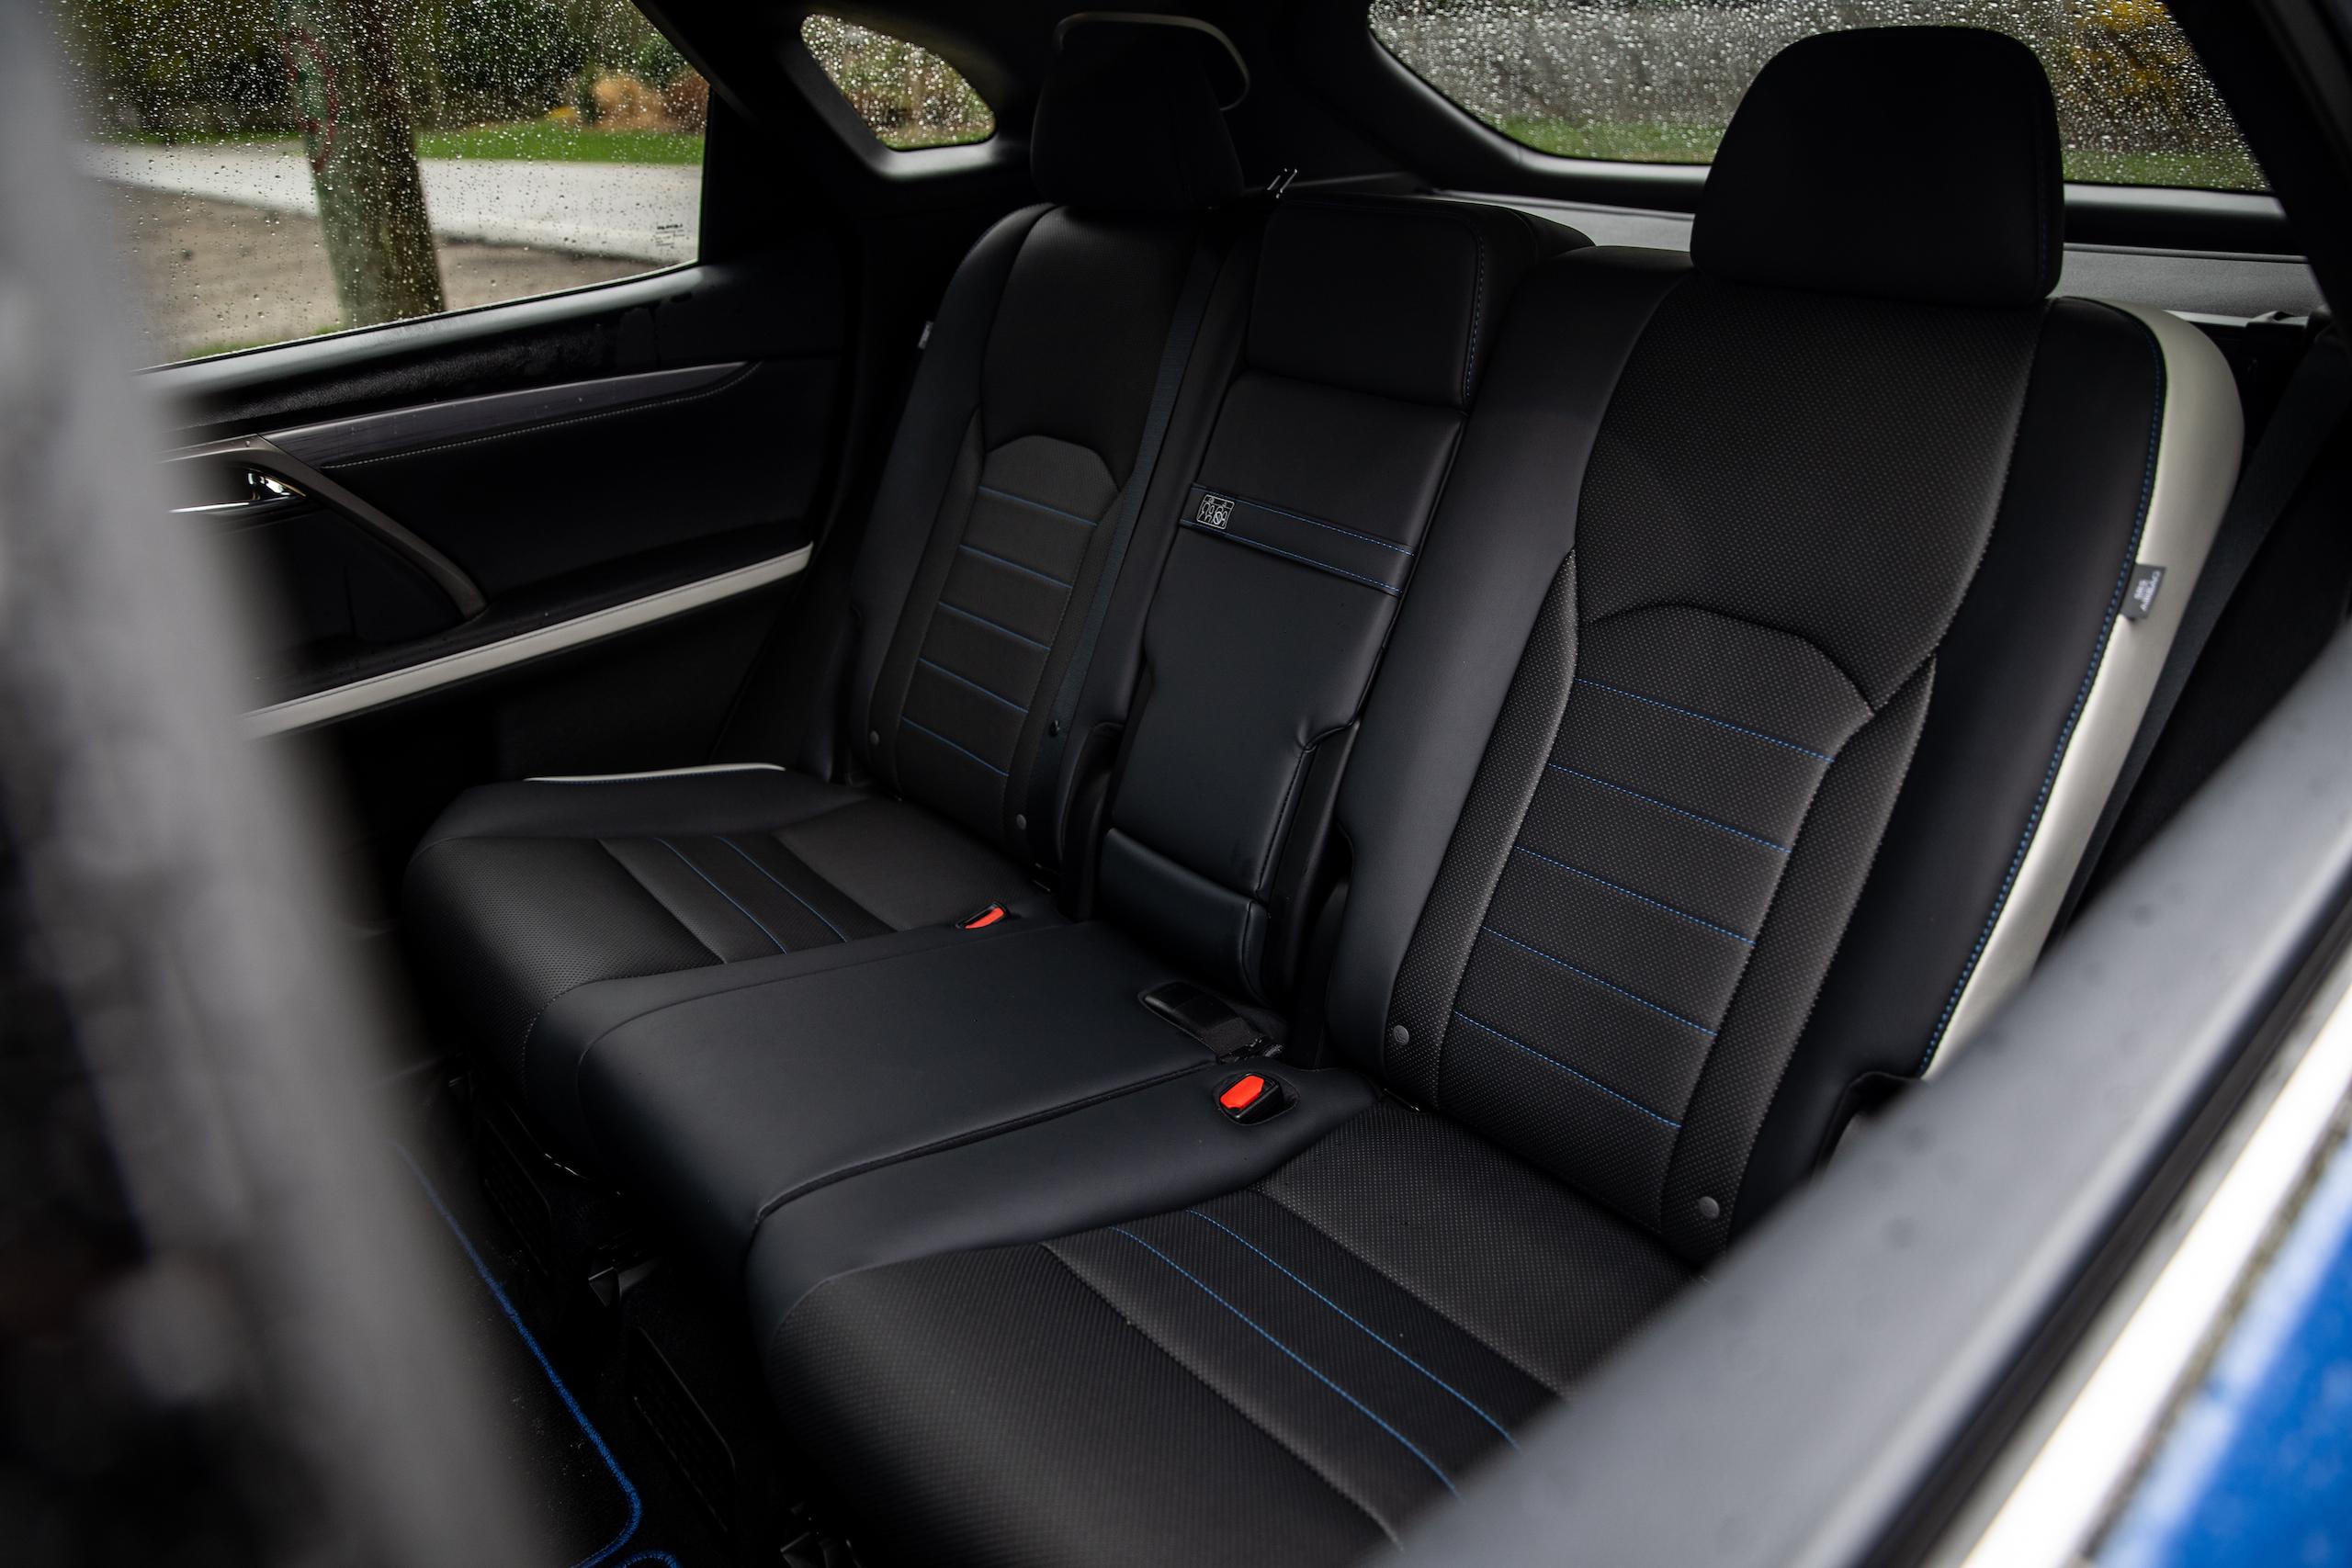 2021 Lexus RX450h interior rear seat